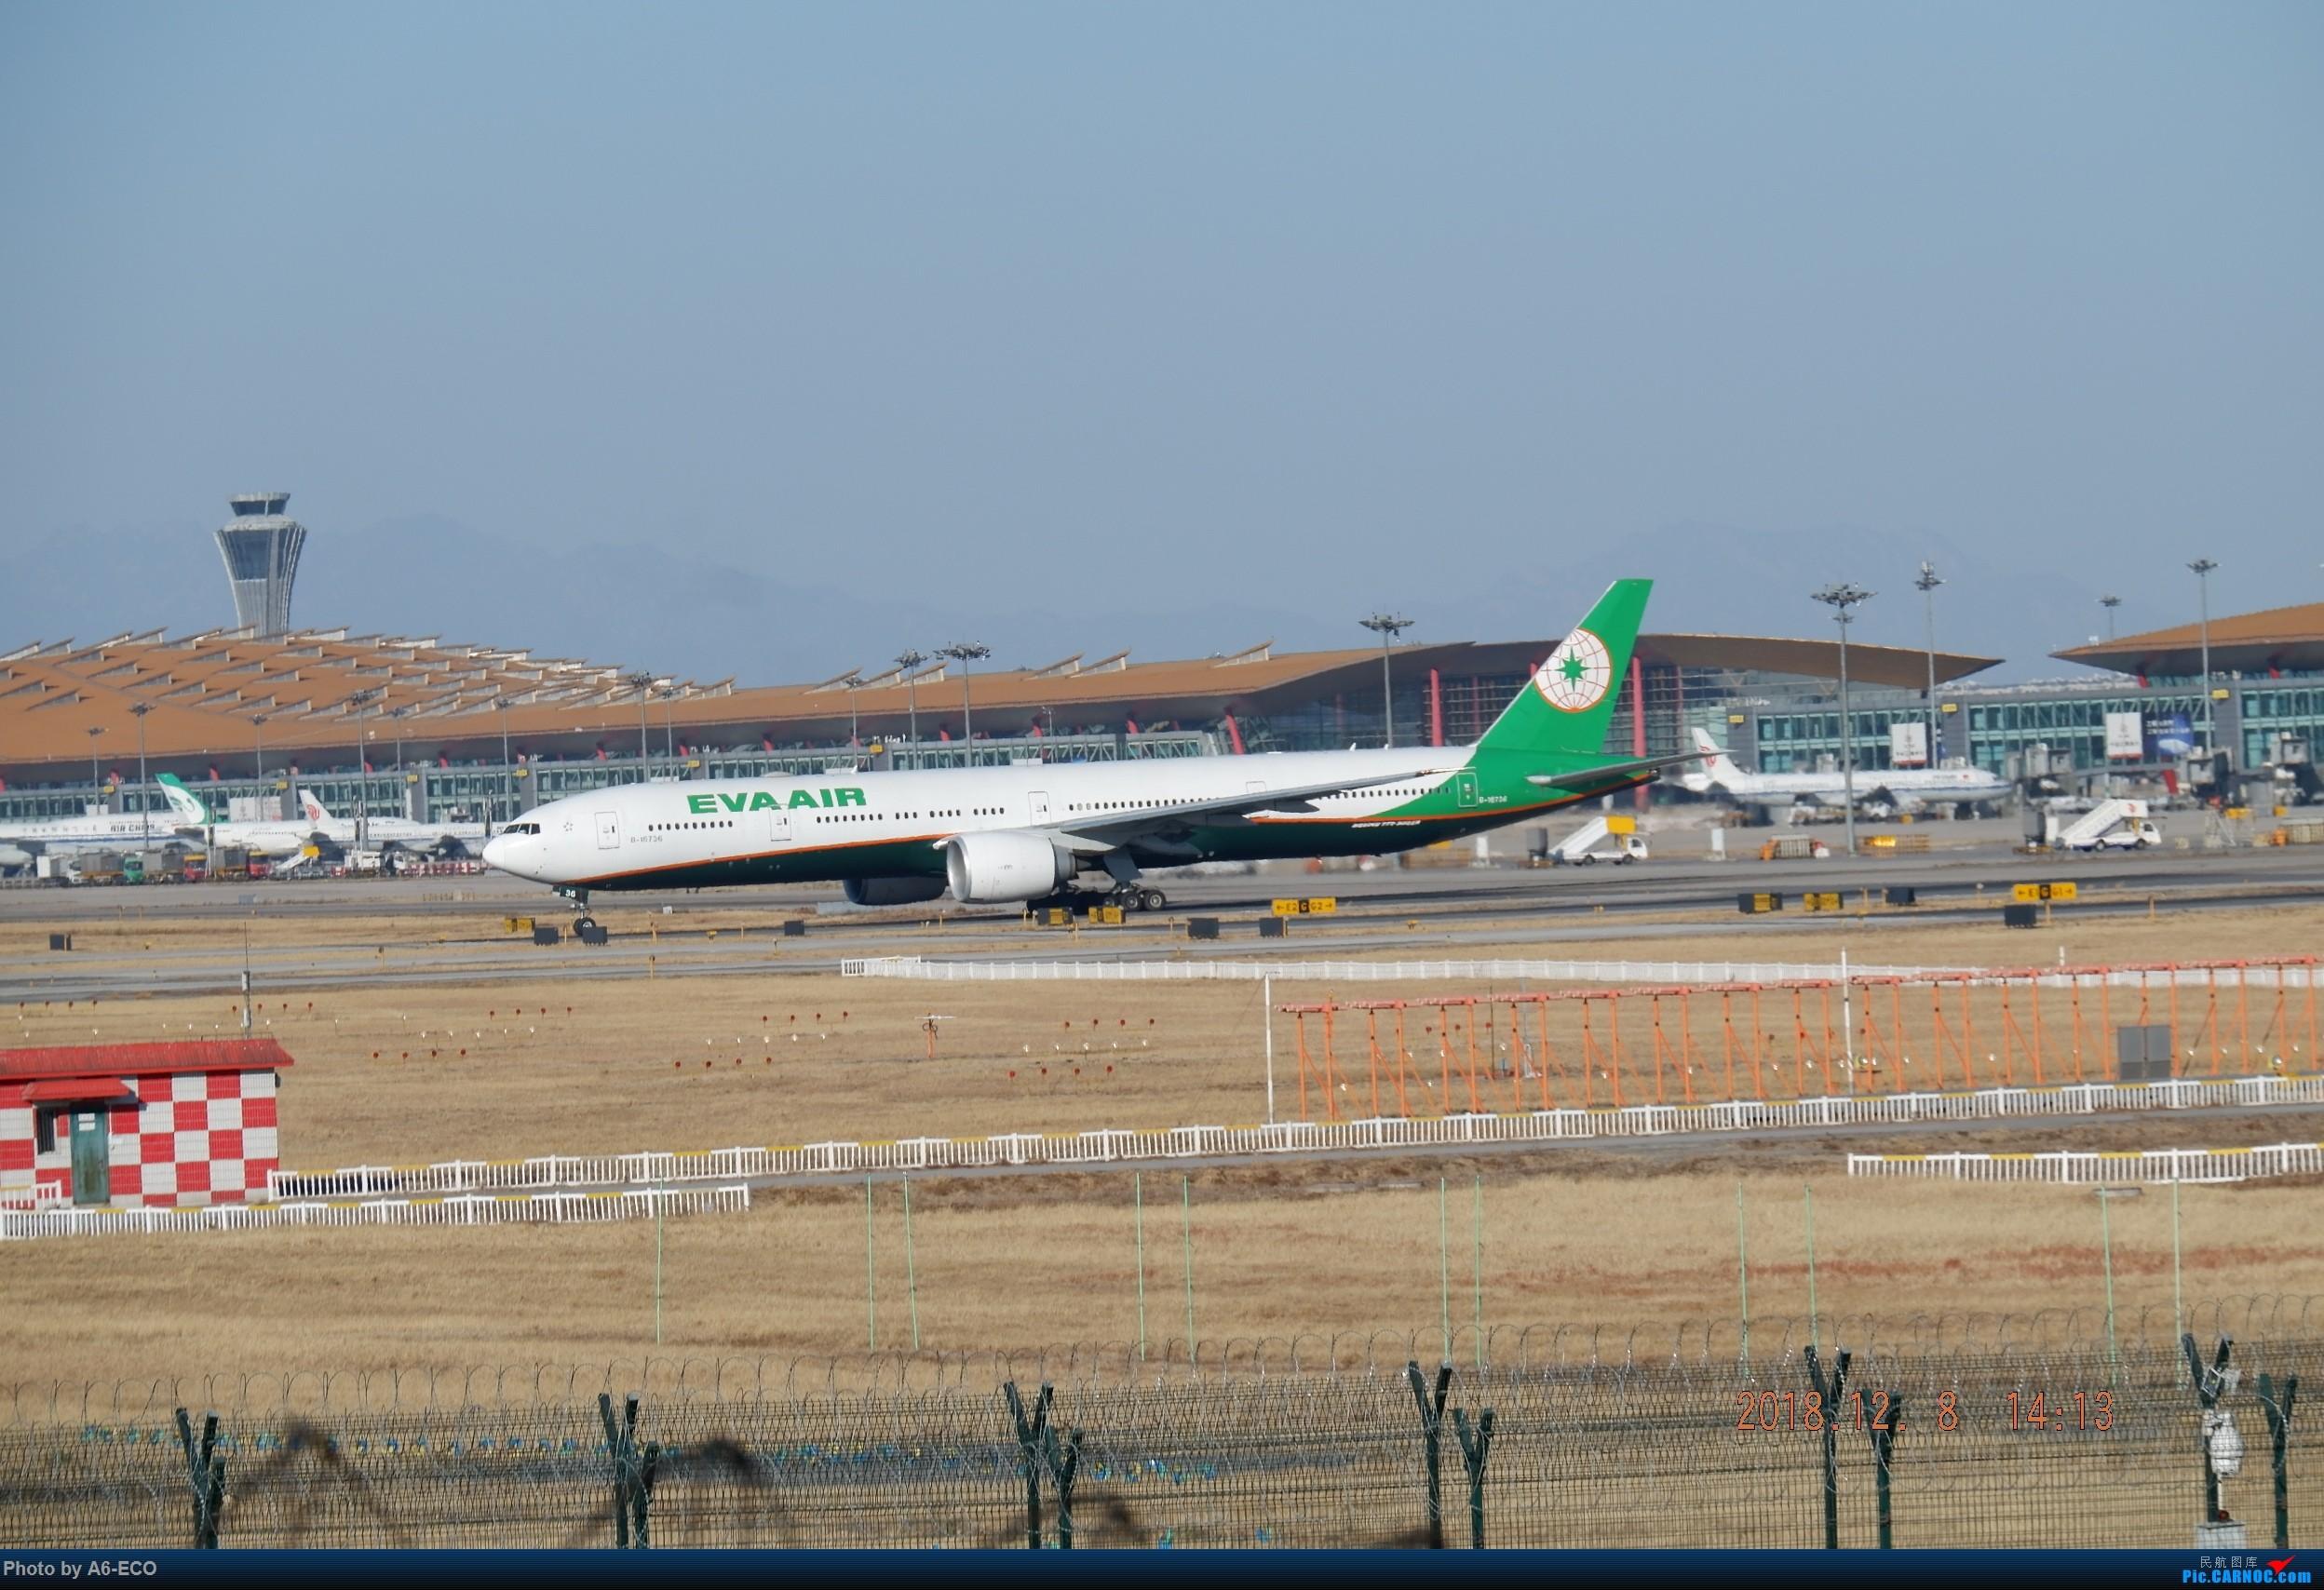 Re:[原创]【Siriの拍机】换镜头,文末有彩蛋! BOEING 777-300ER B-16736 中国北京首都国际机场